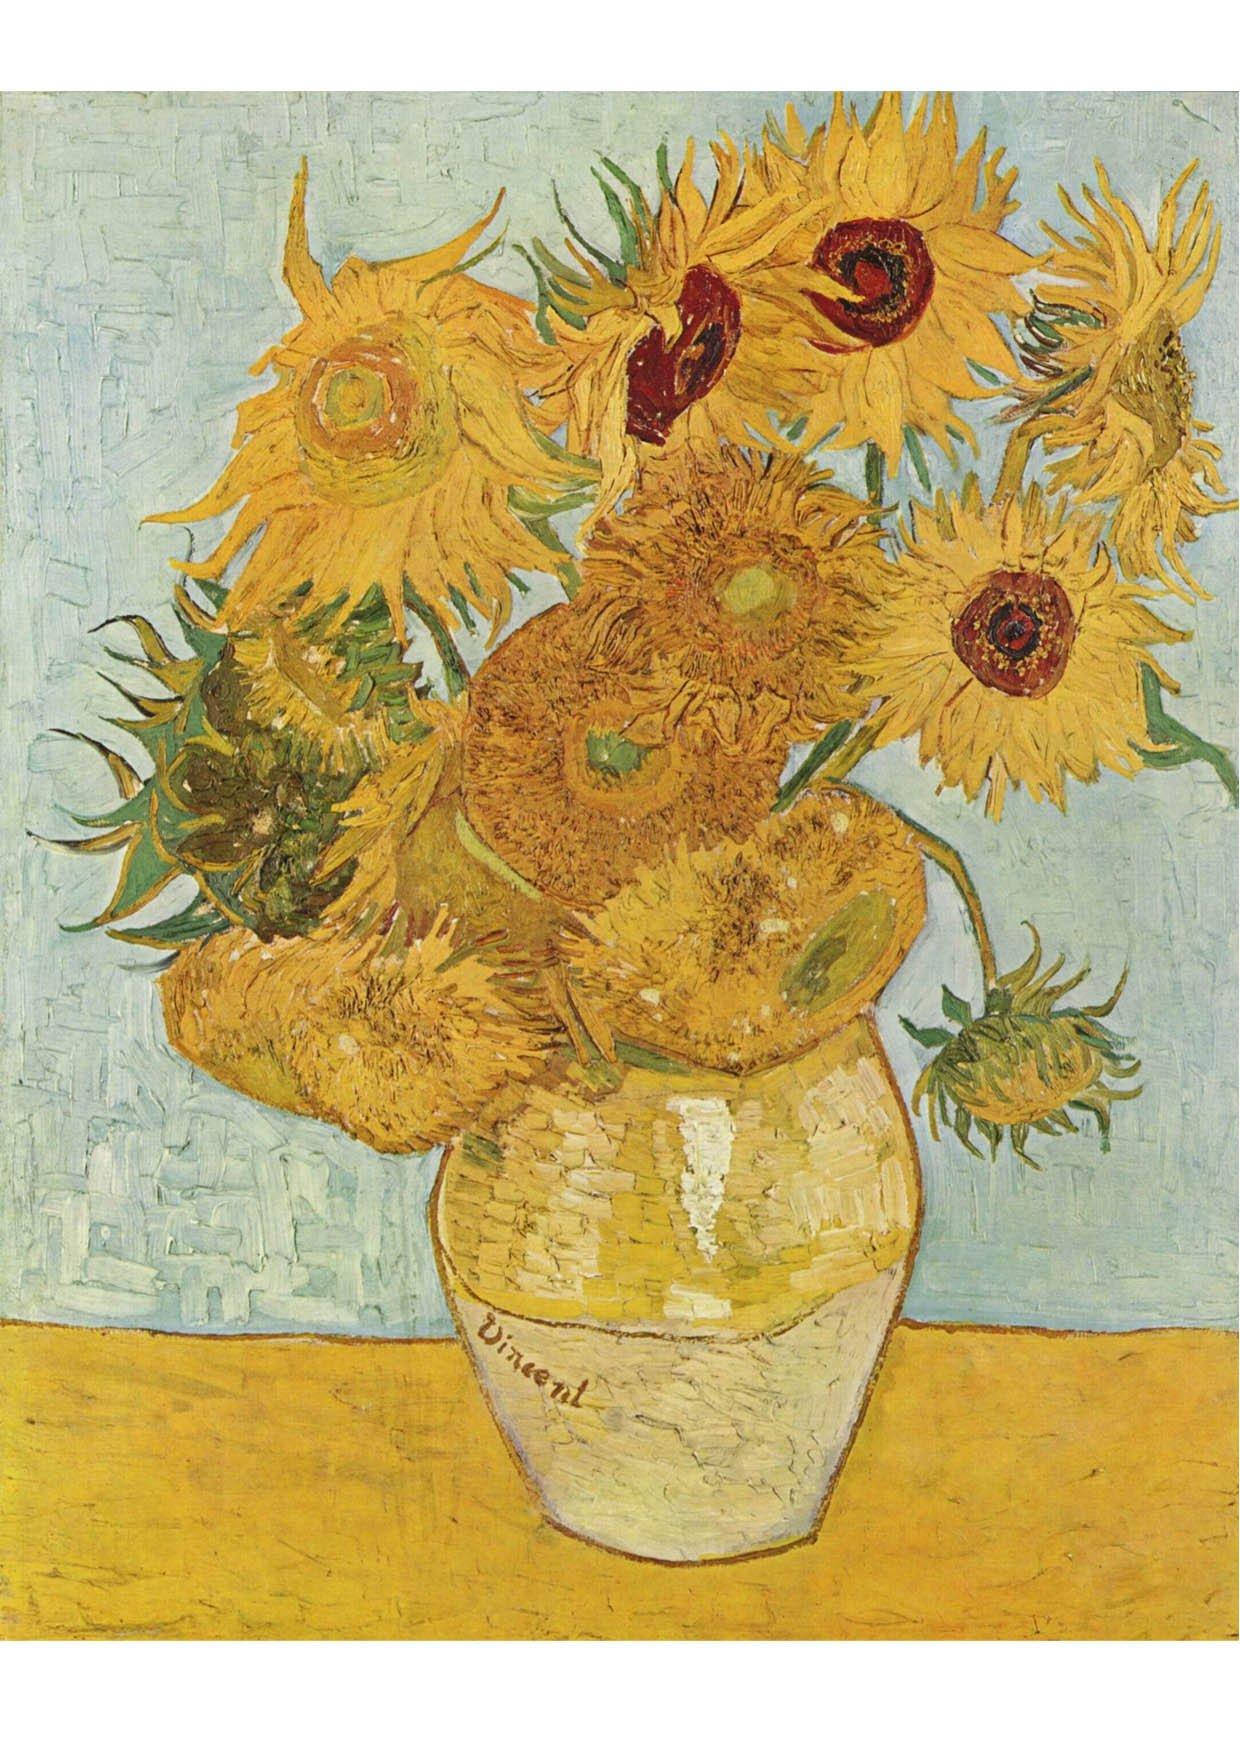 Bild Vincent van Gogh - Sonnenblumen - Abb. 17055